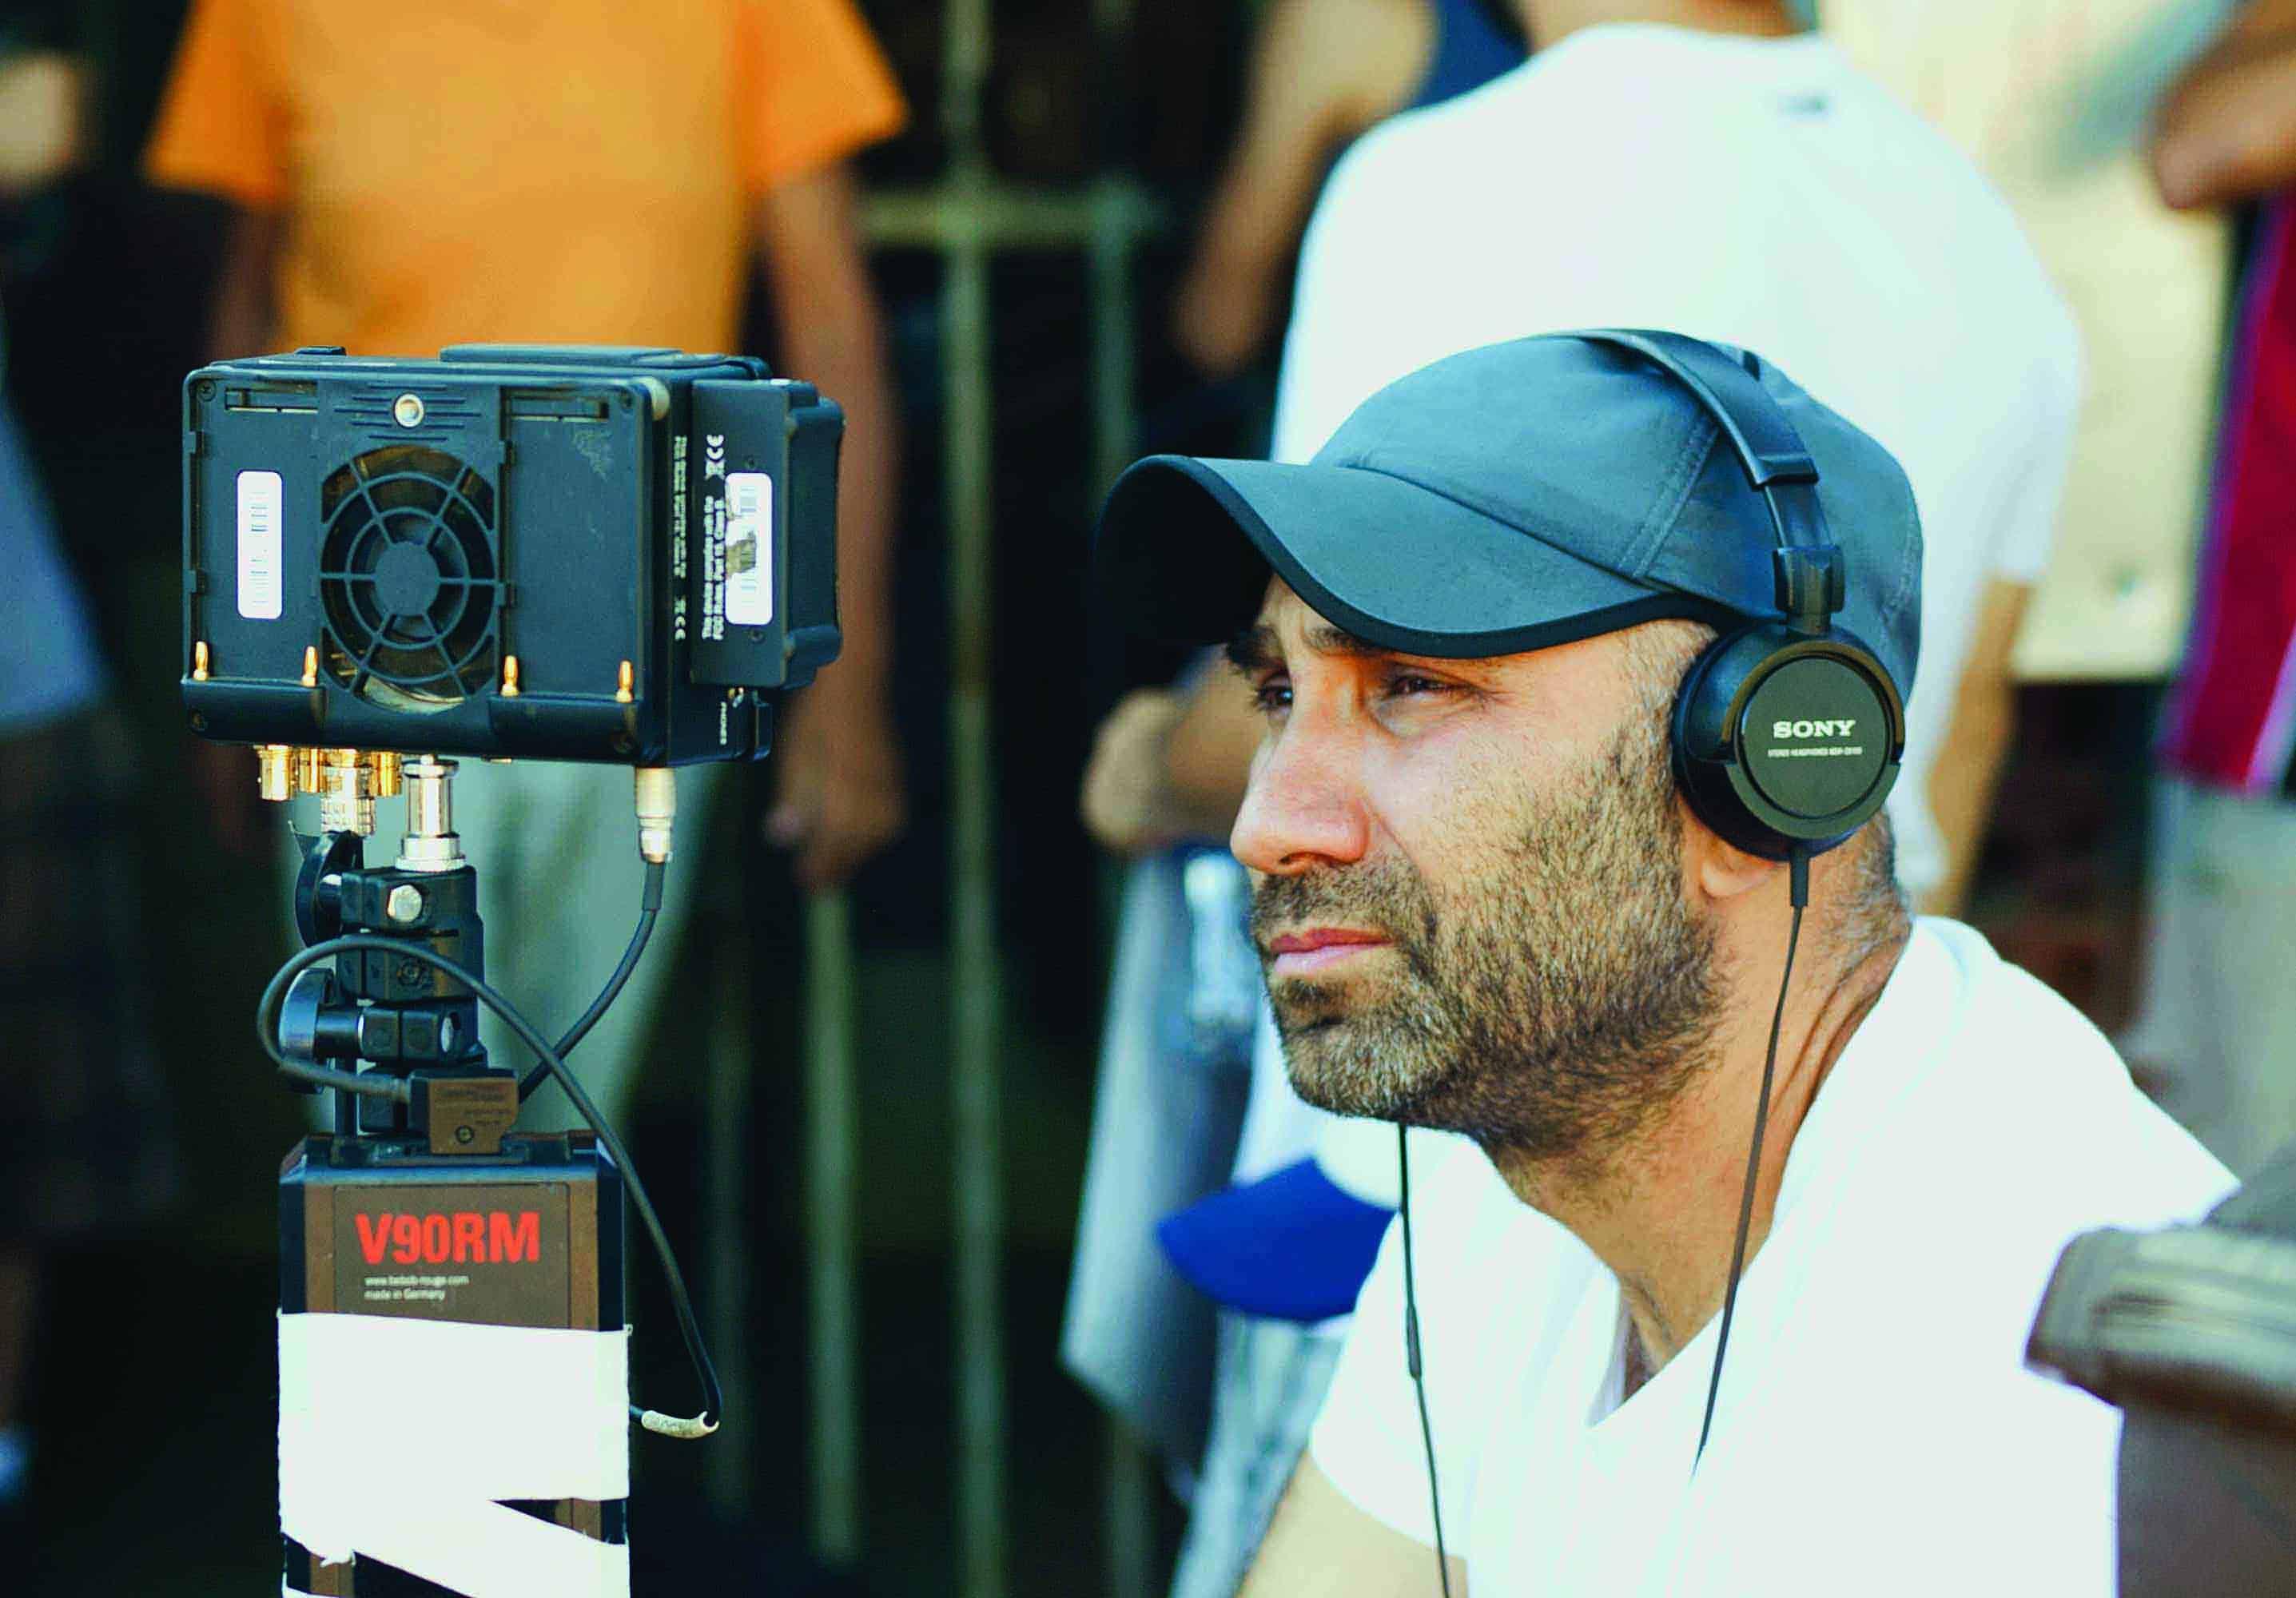 Director Esteban Ramírez focuses on Costa Rica's prison system in his latest project.